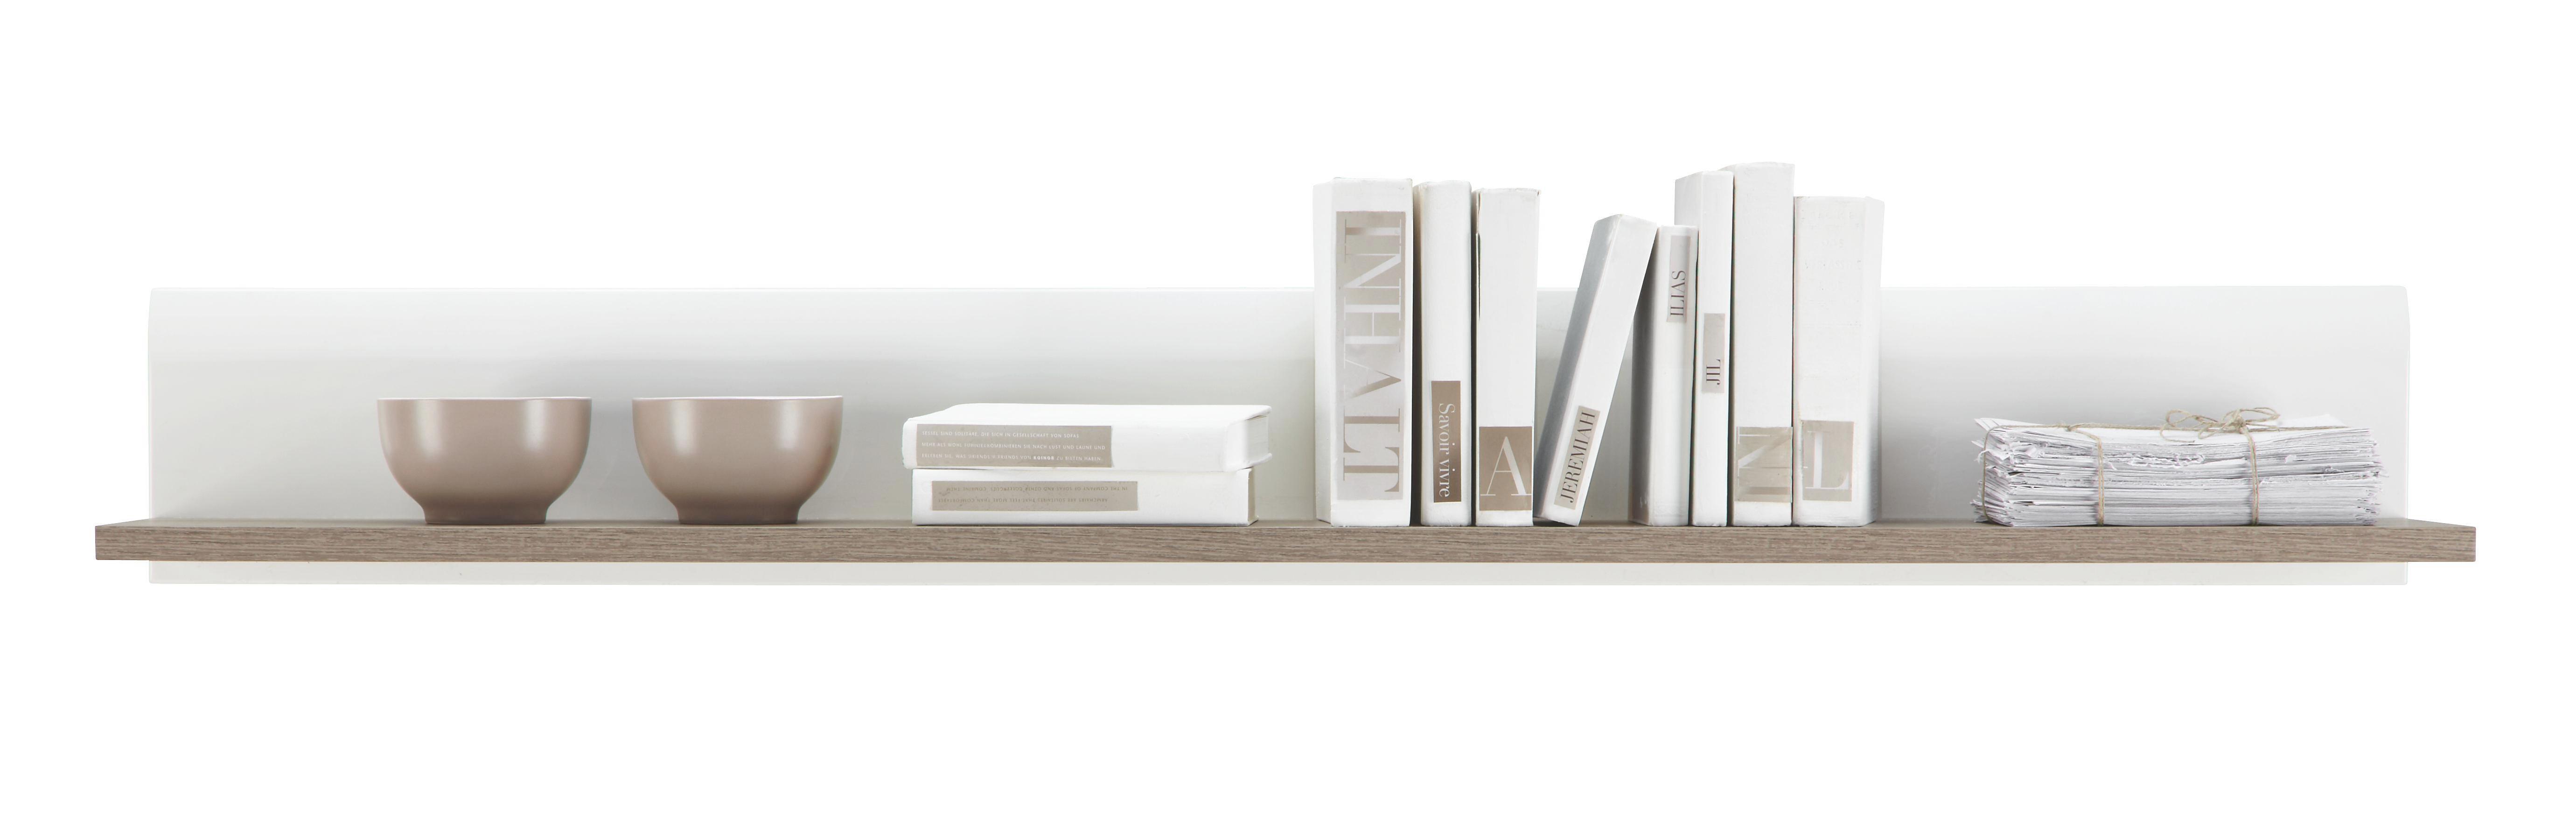 Wandboard in Weiß/Trüffel - Trüffeleichefarben/Weiß, MODERN, Holzwerkstoff (150/20/20cm)